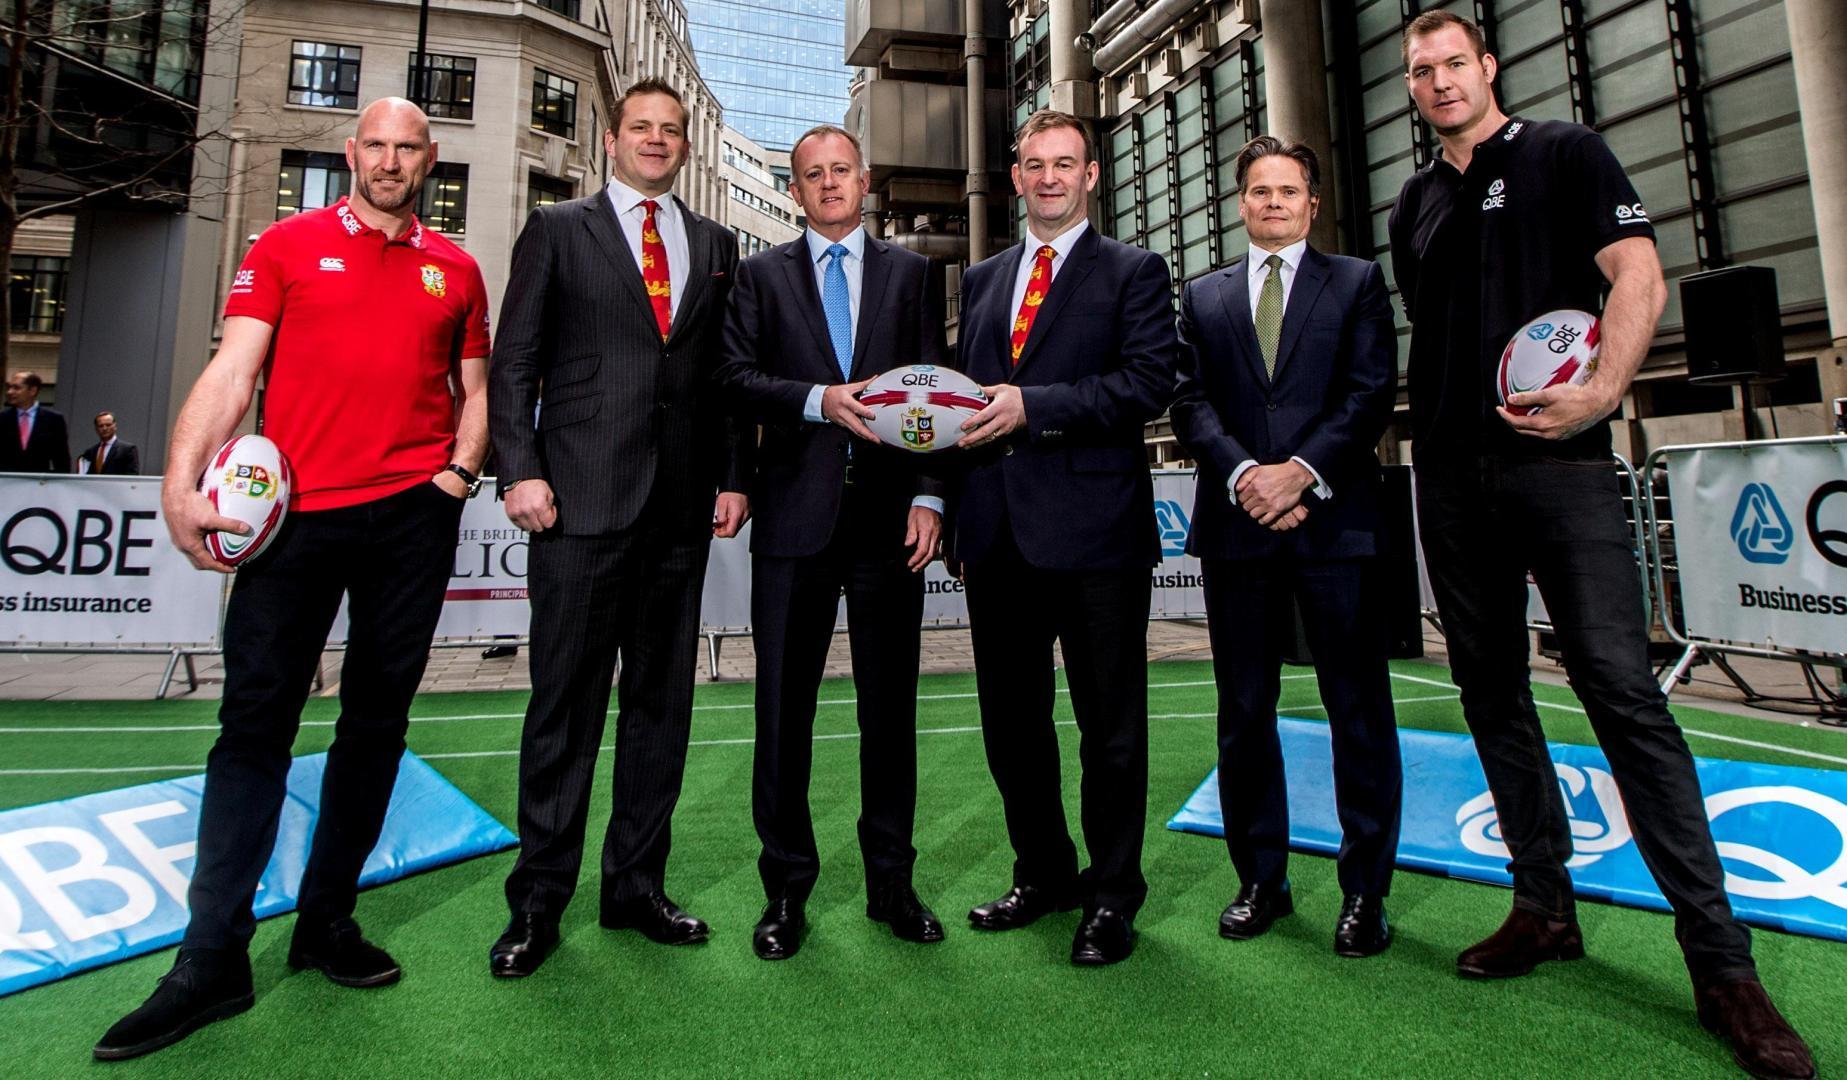 QBE to partner the British & Irish Lions for 2017 tour to New Zealand